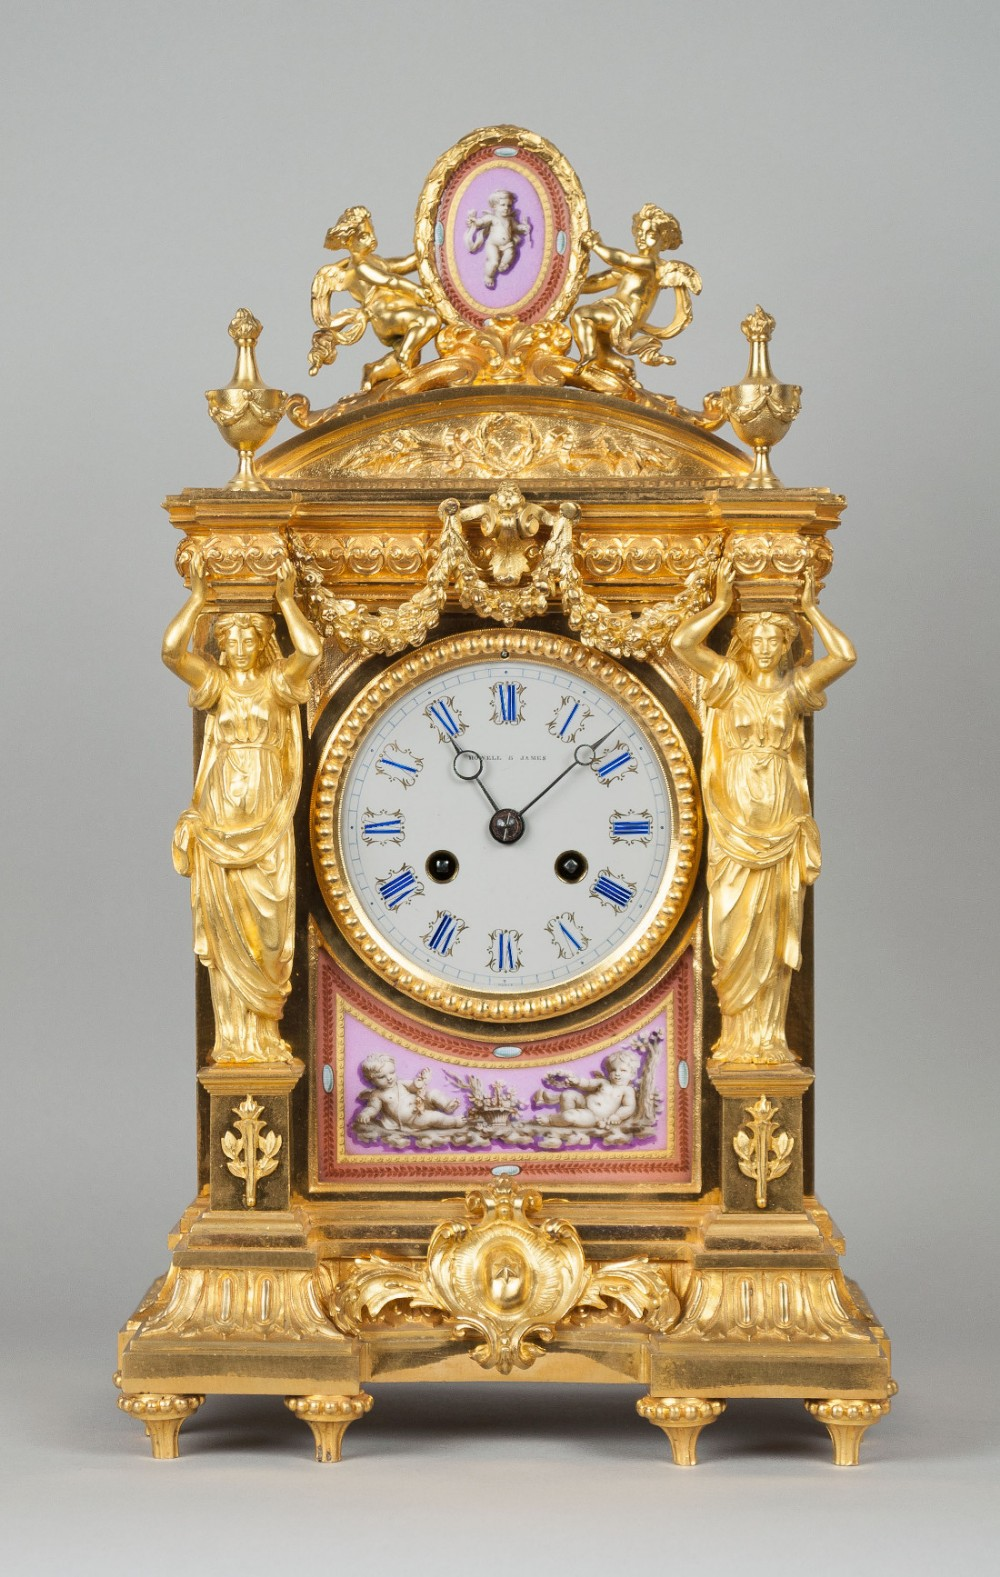 Howell & James Of Regent Street London Mantel Clock C.1870 421249 Sellingantiques.co.uk